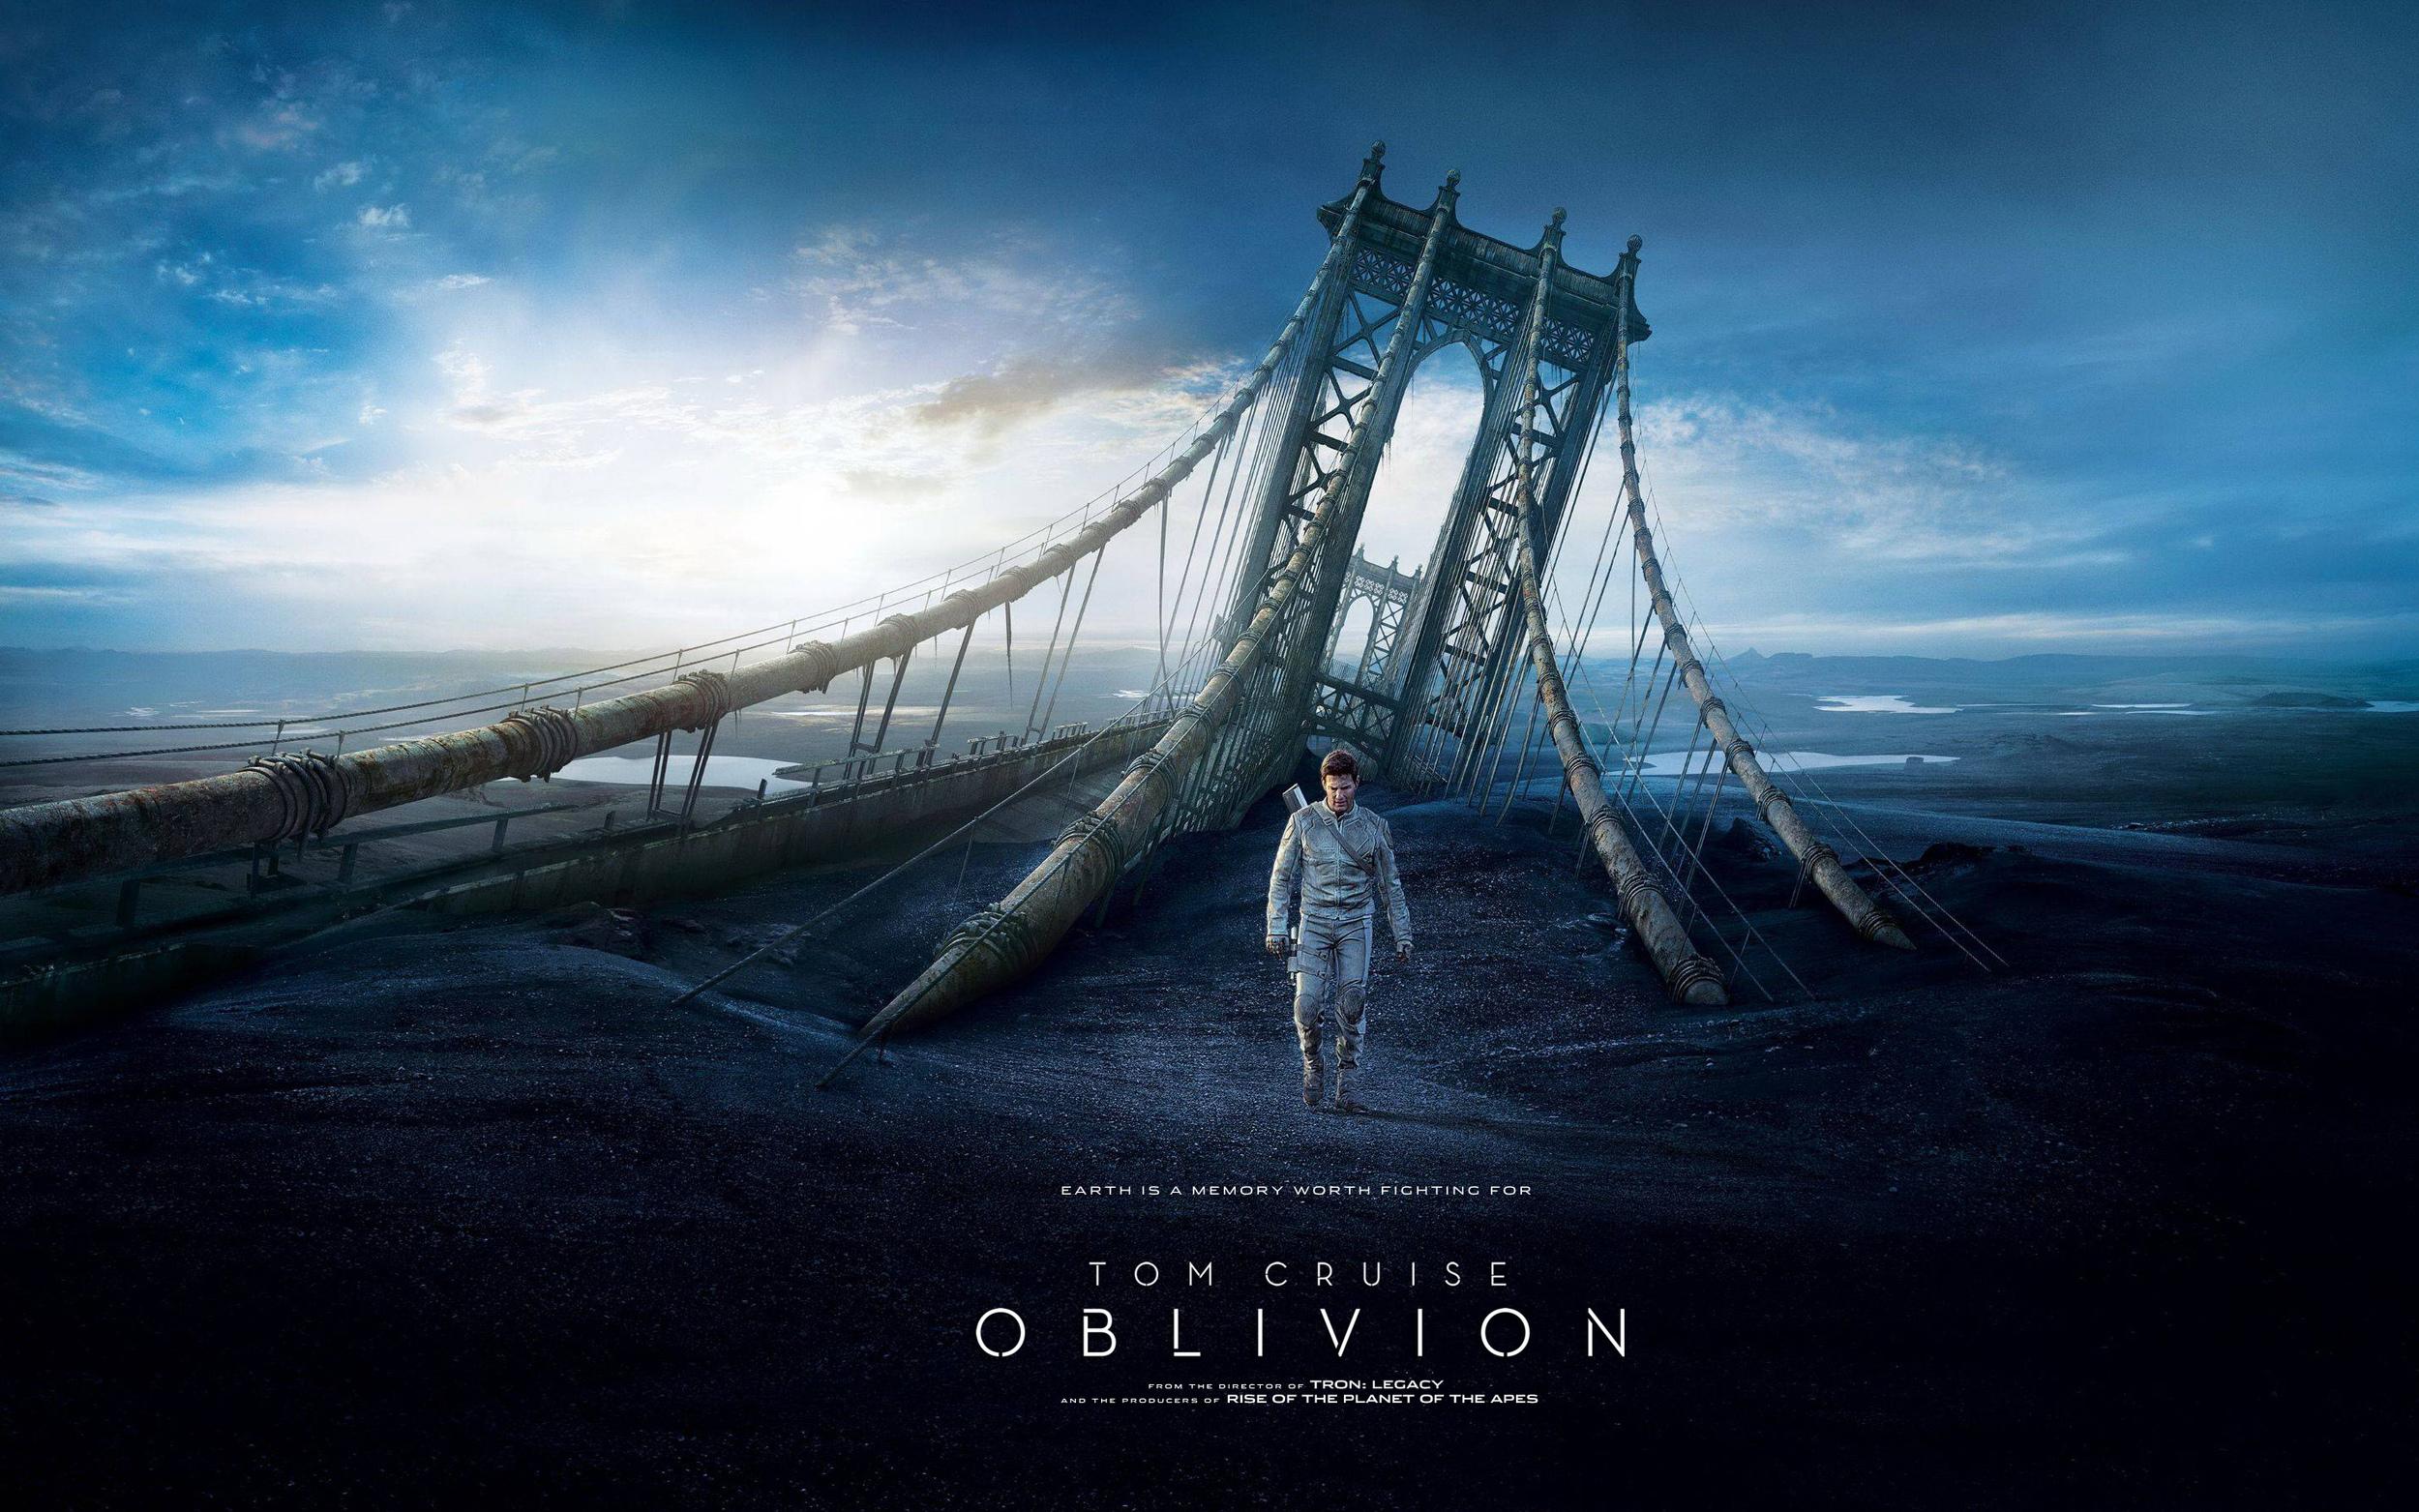 oblivion_movie_2013-wide.jpg